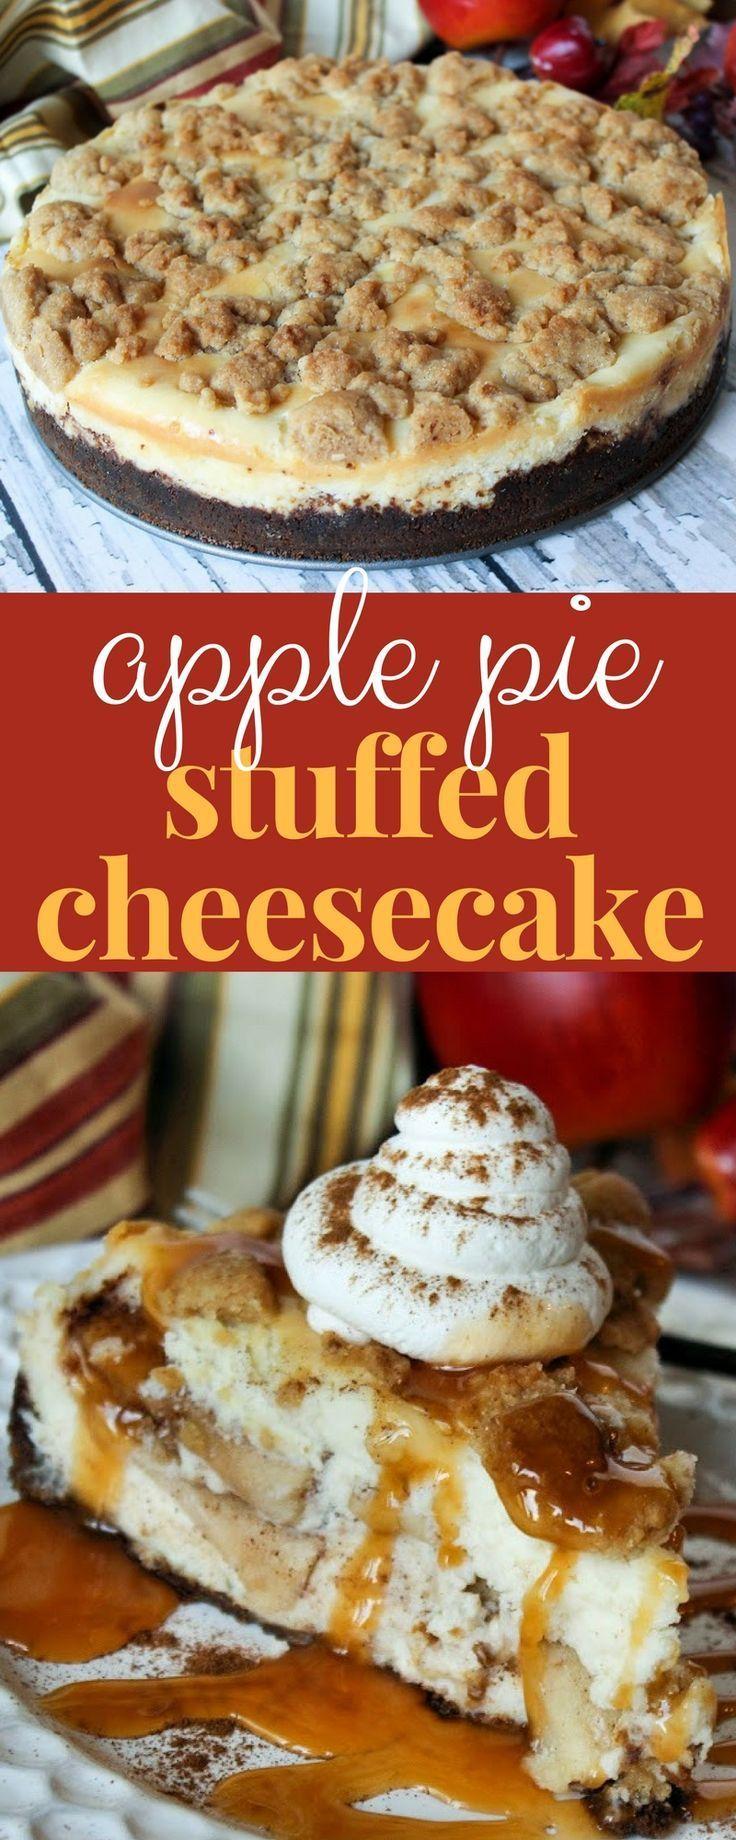 Apple Pie Stuffed Cheesecake is the ultimate fall dessert! #cheesecakerecipe